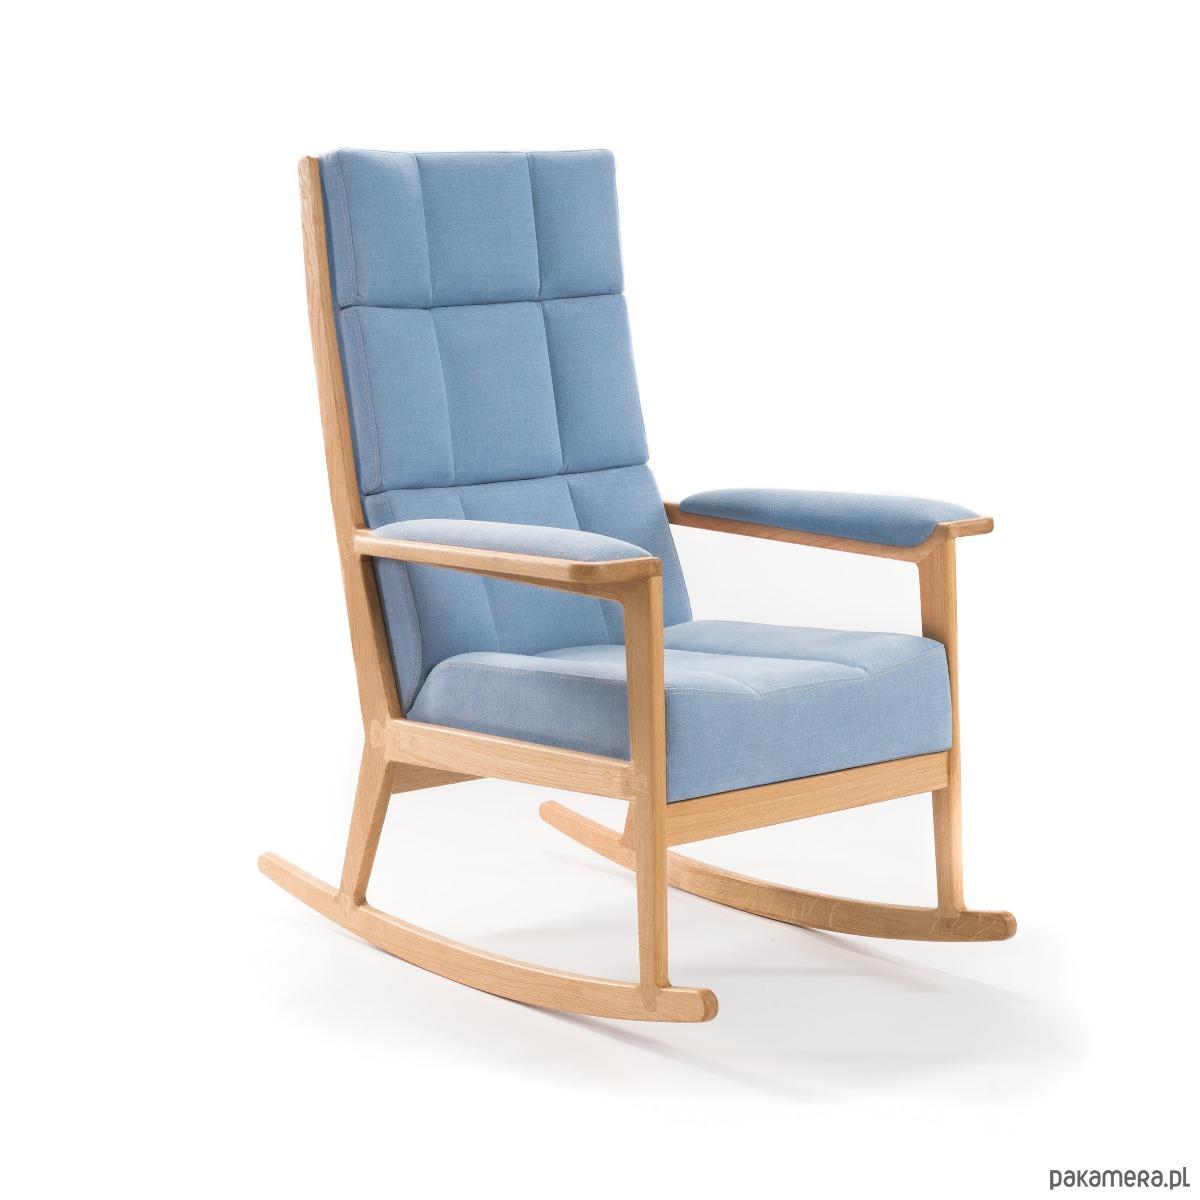 Lili Fotel Bujany Chambray Blue Meble Fotele Pakamerapl